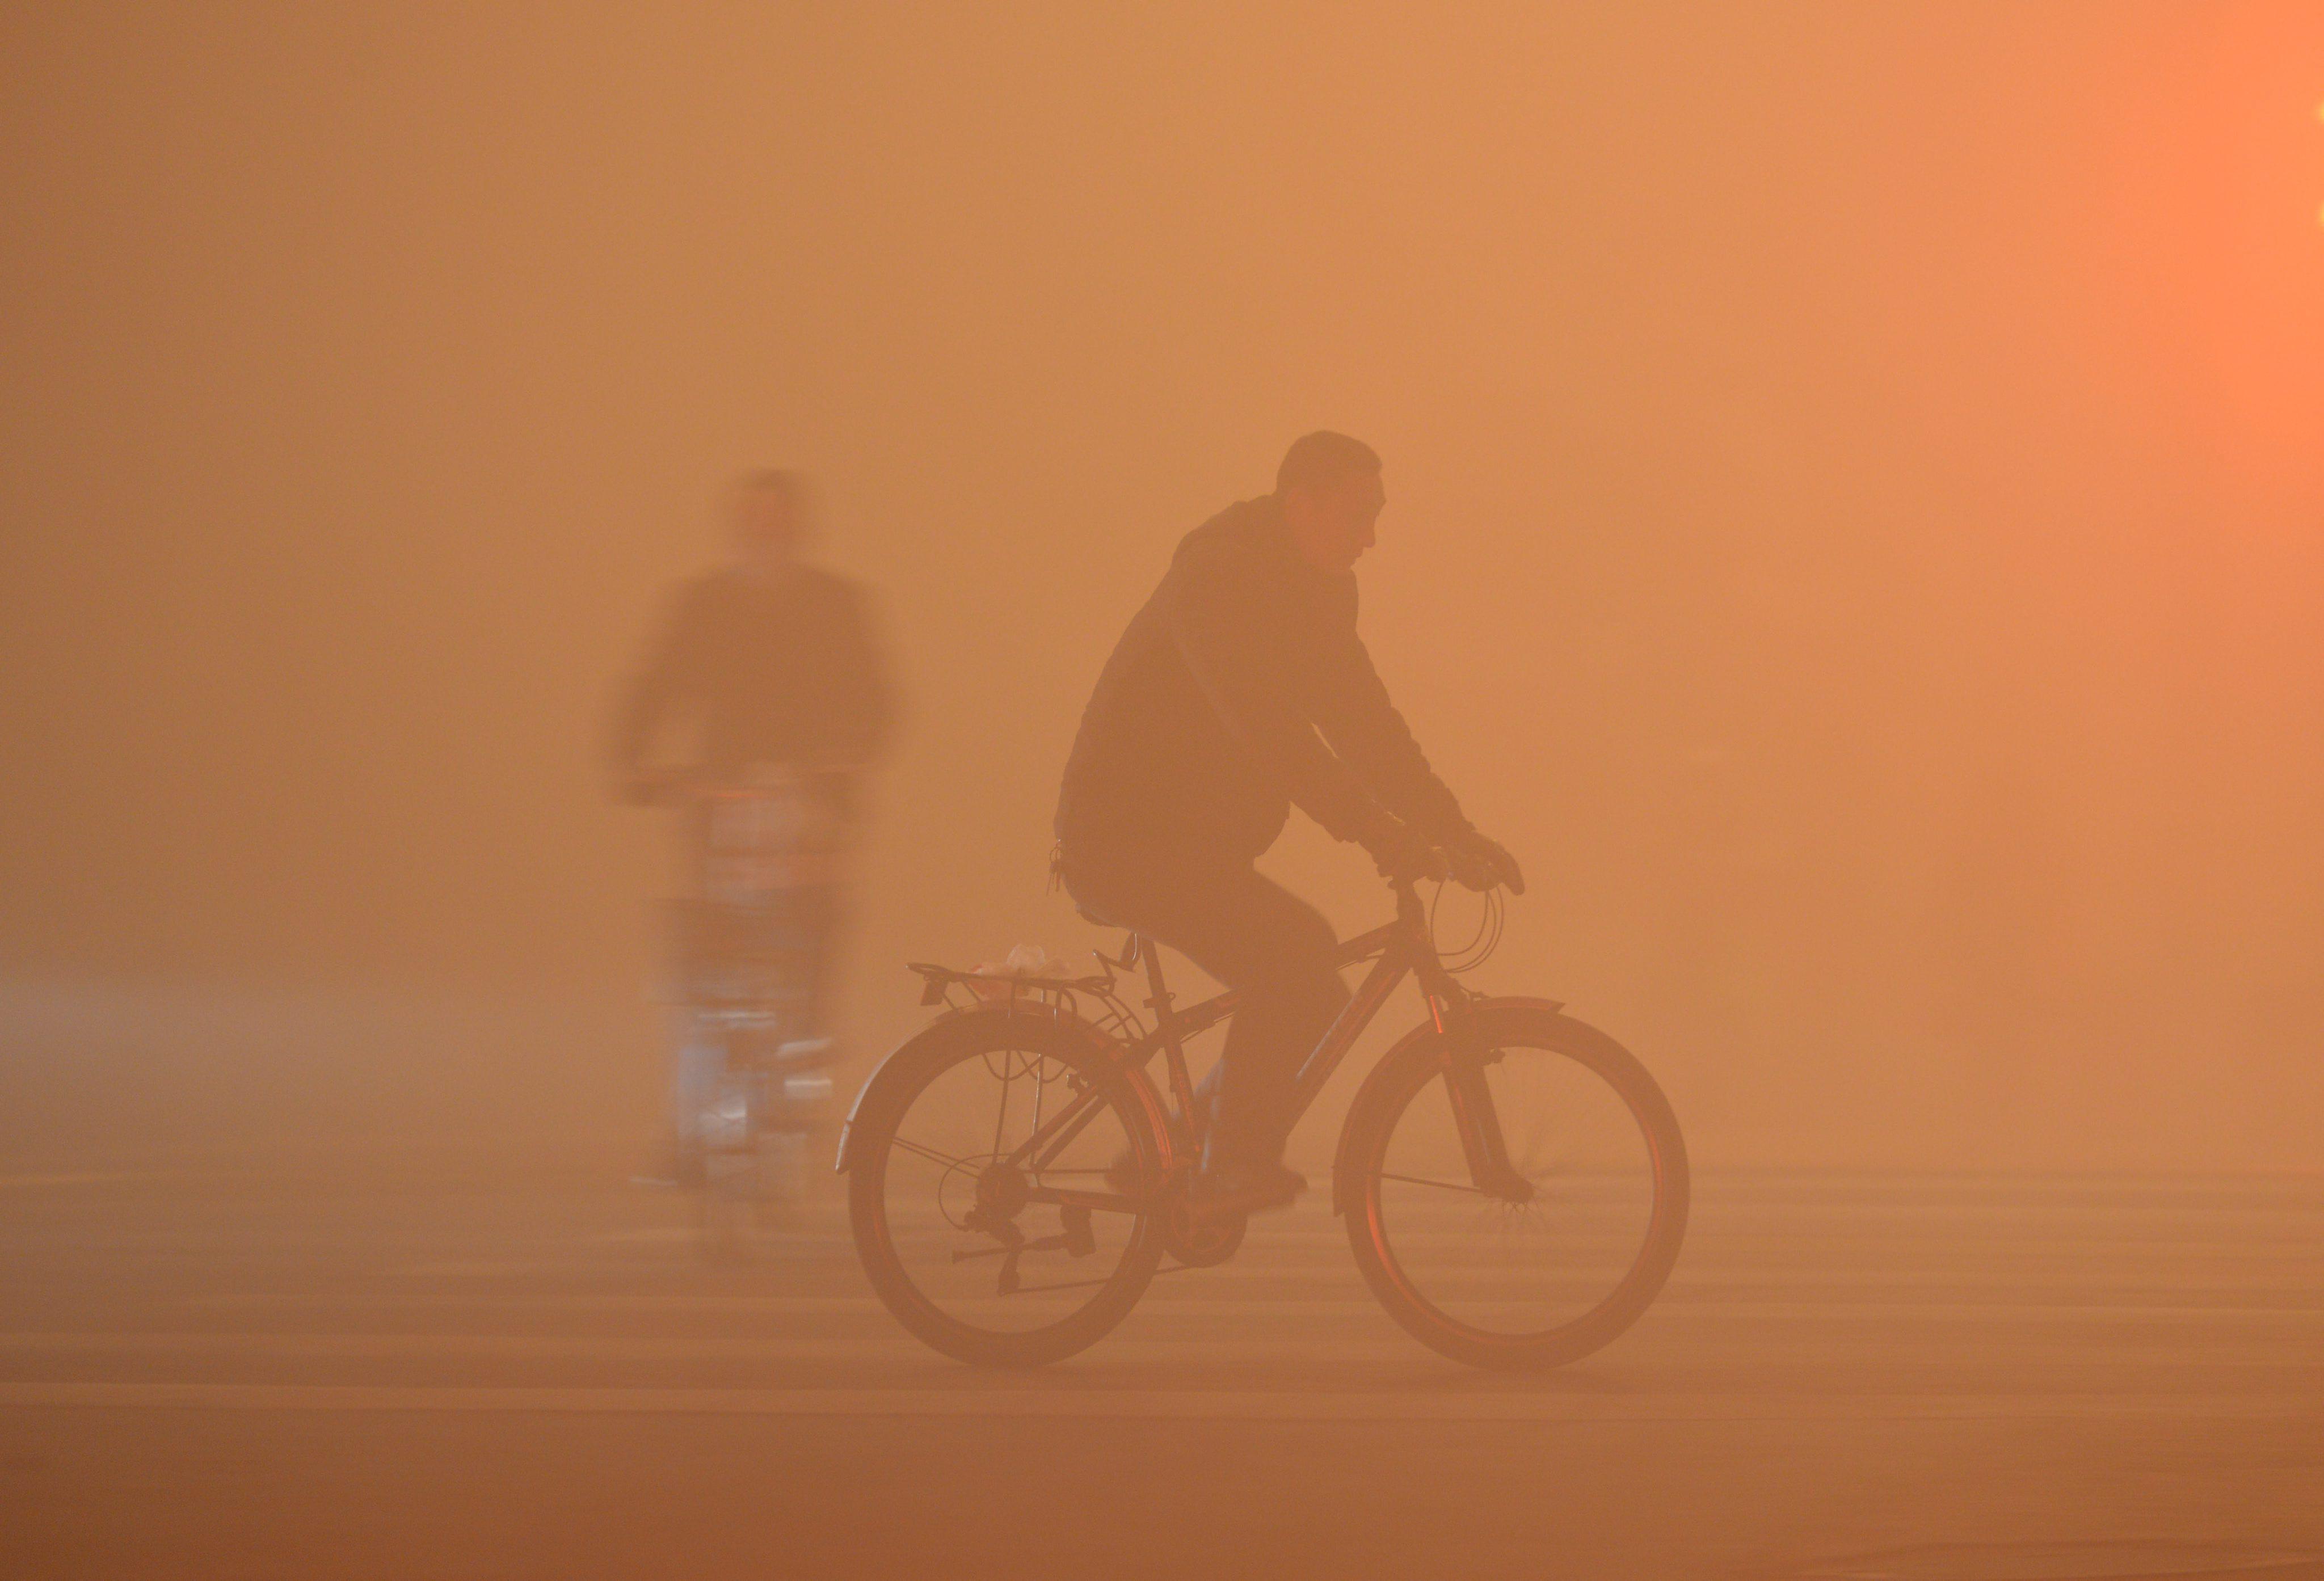 Pequim. Vídeo mostra avanço